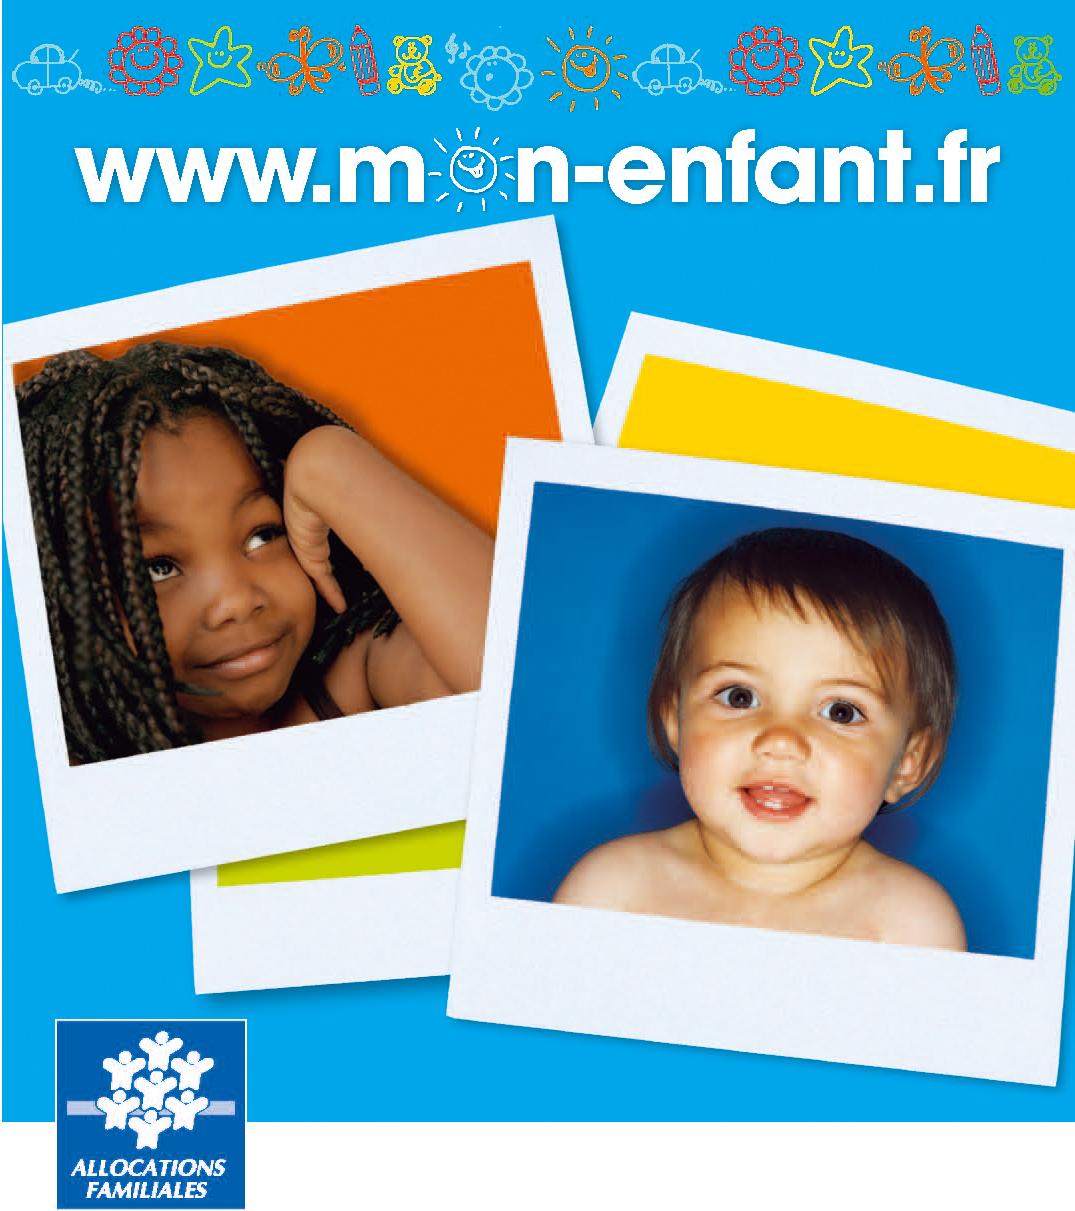 Monenfant.fr